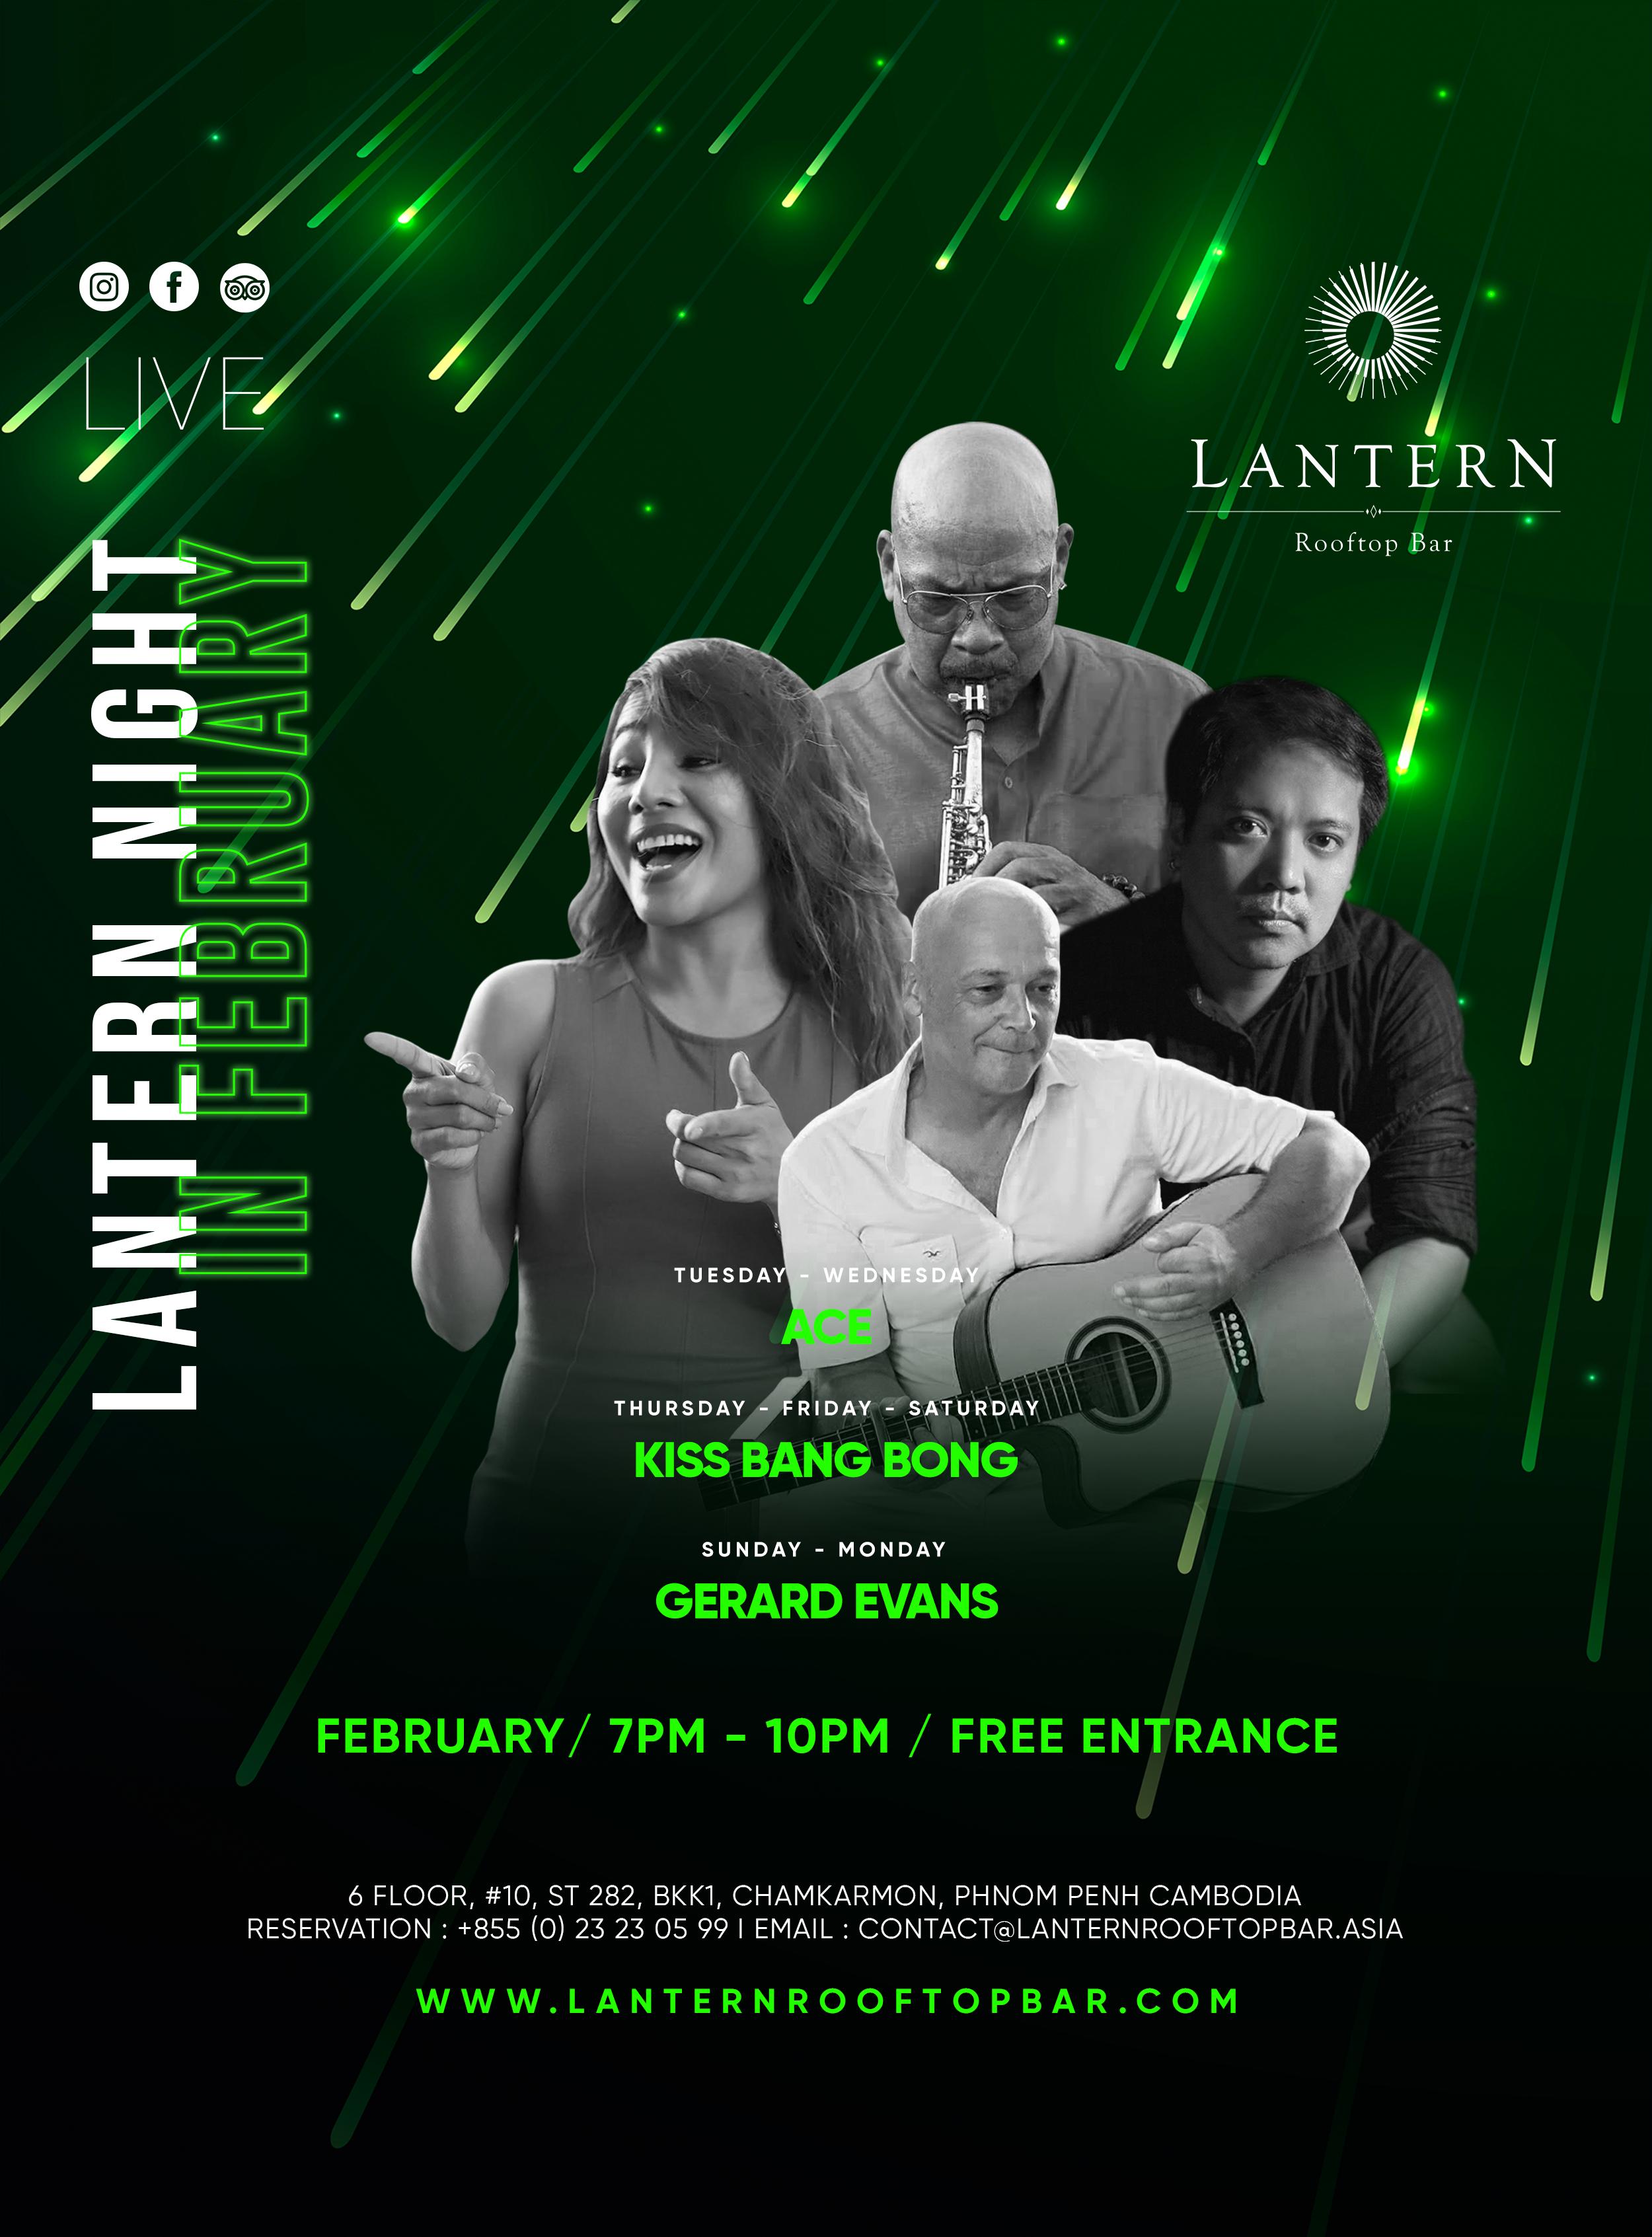 February Lantern Nights - Live music 7 days a week!